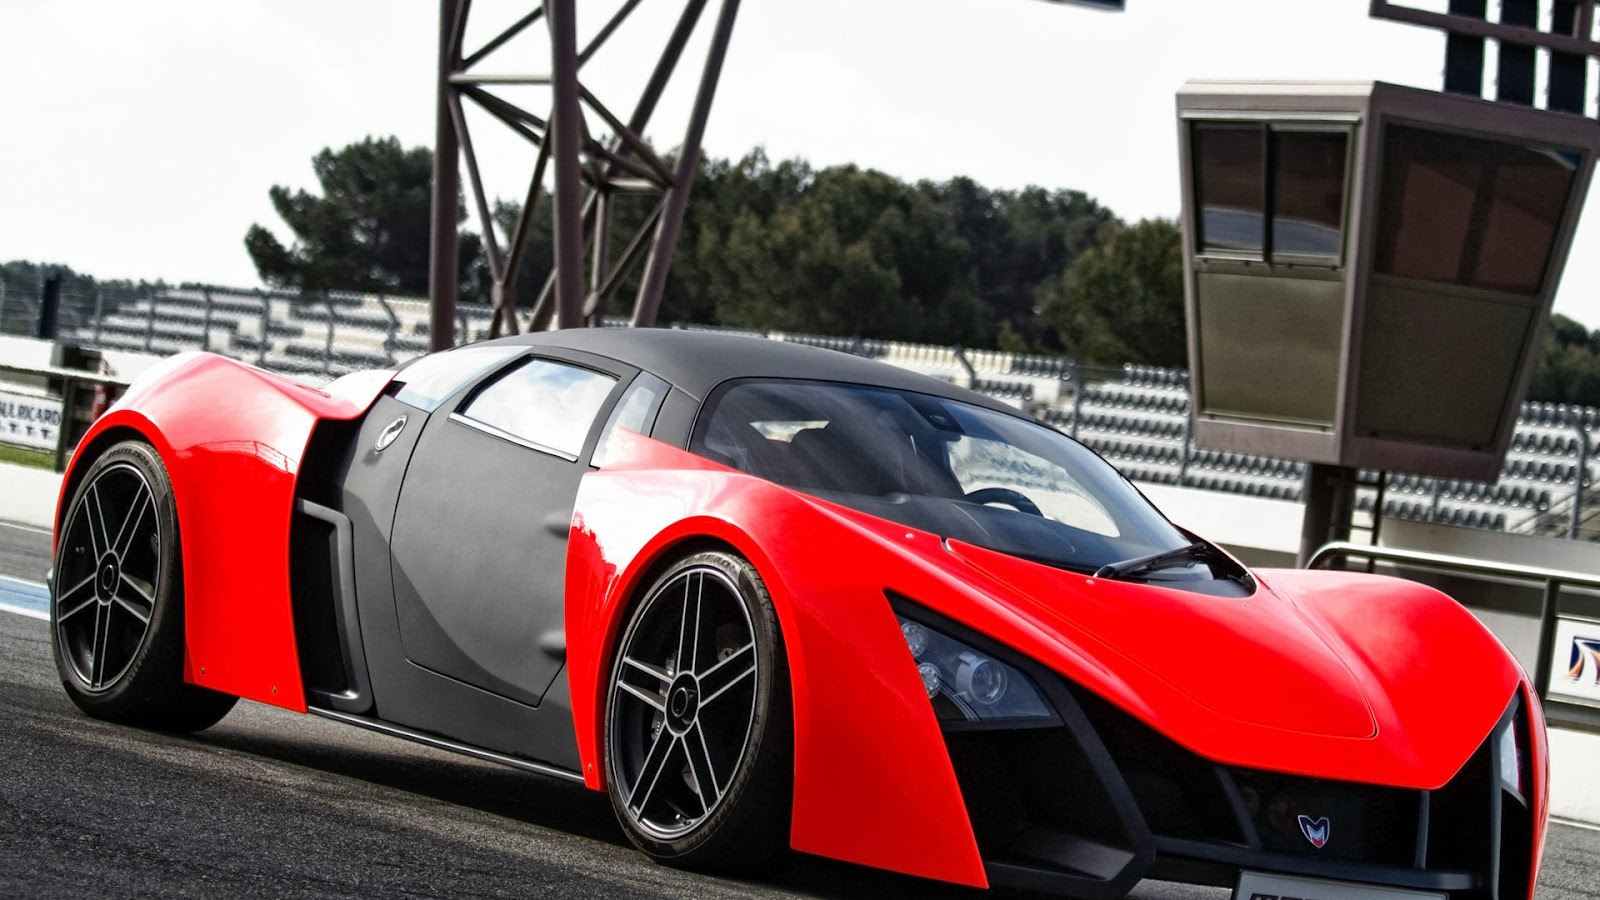 Red black fastest car